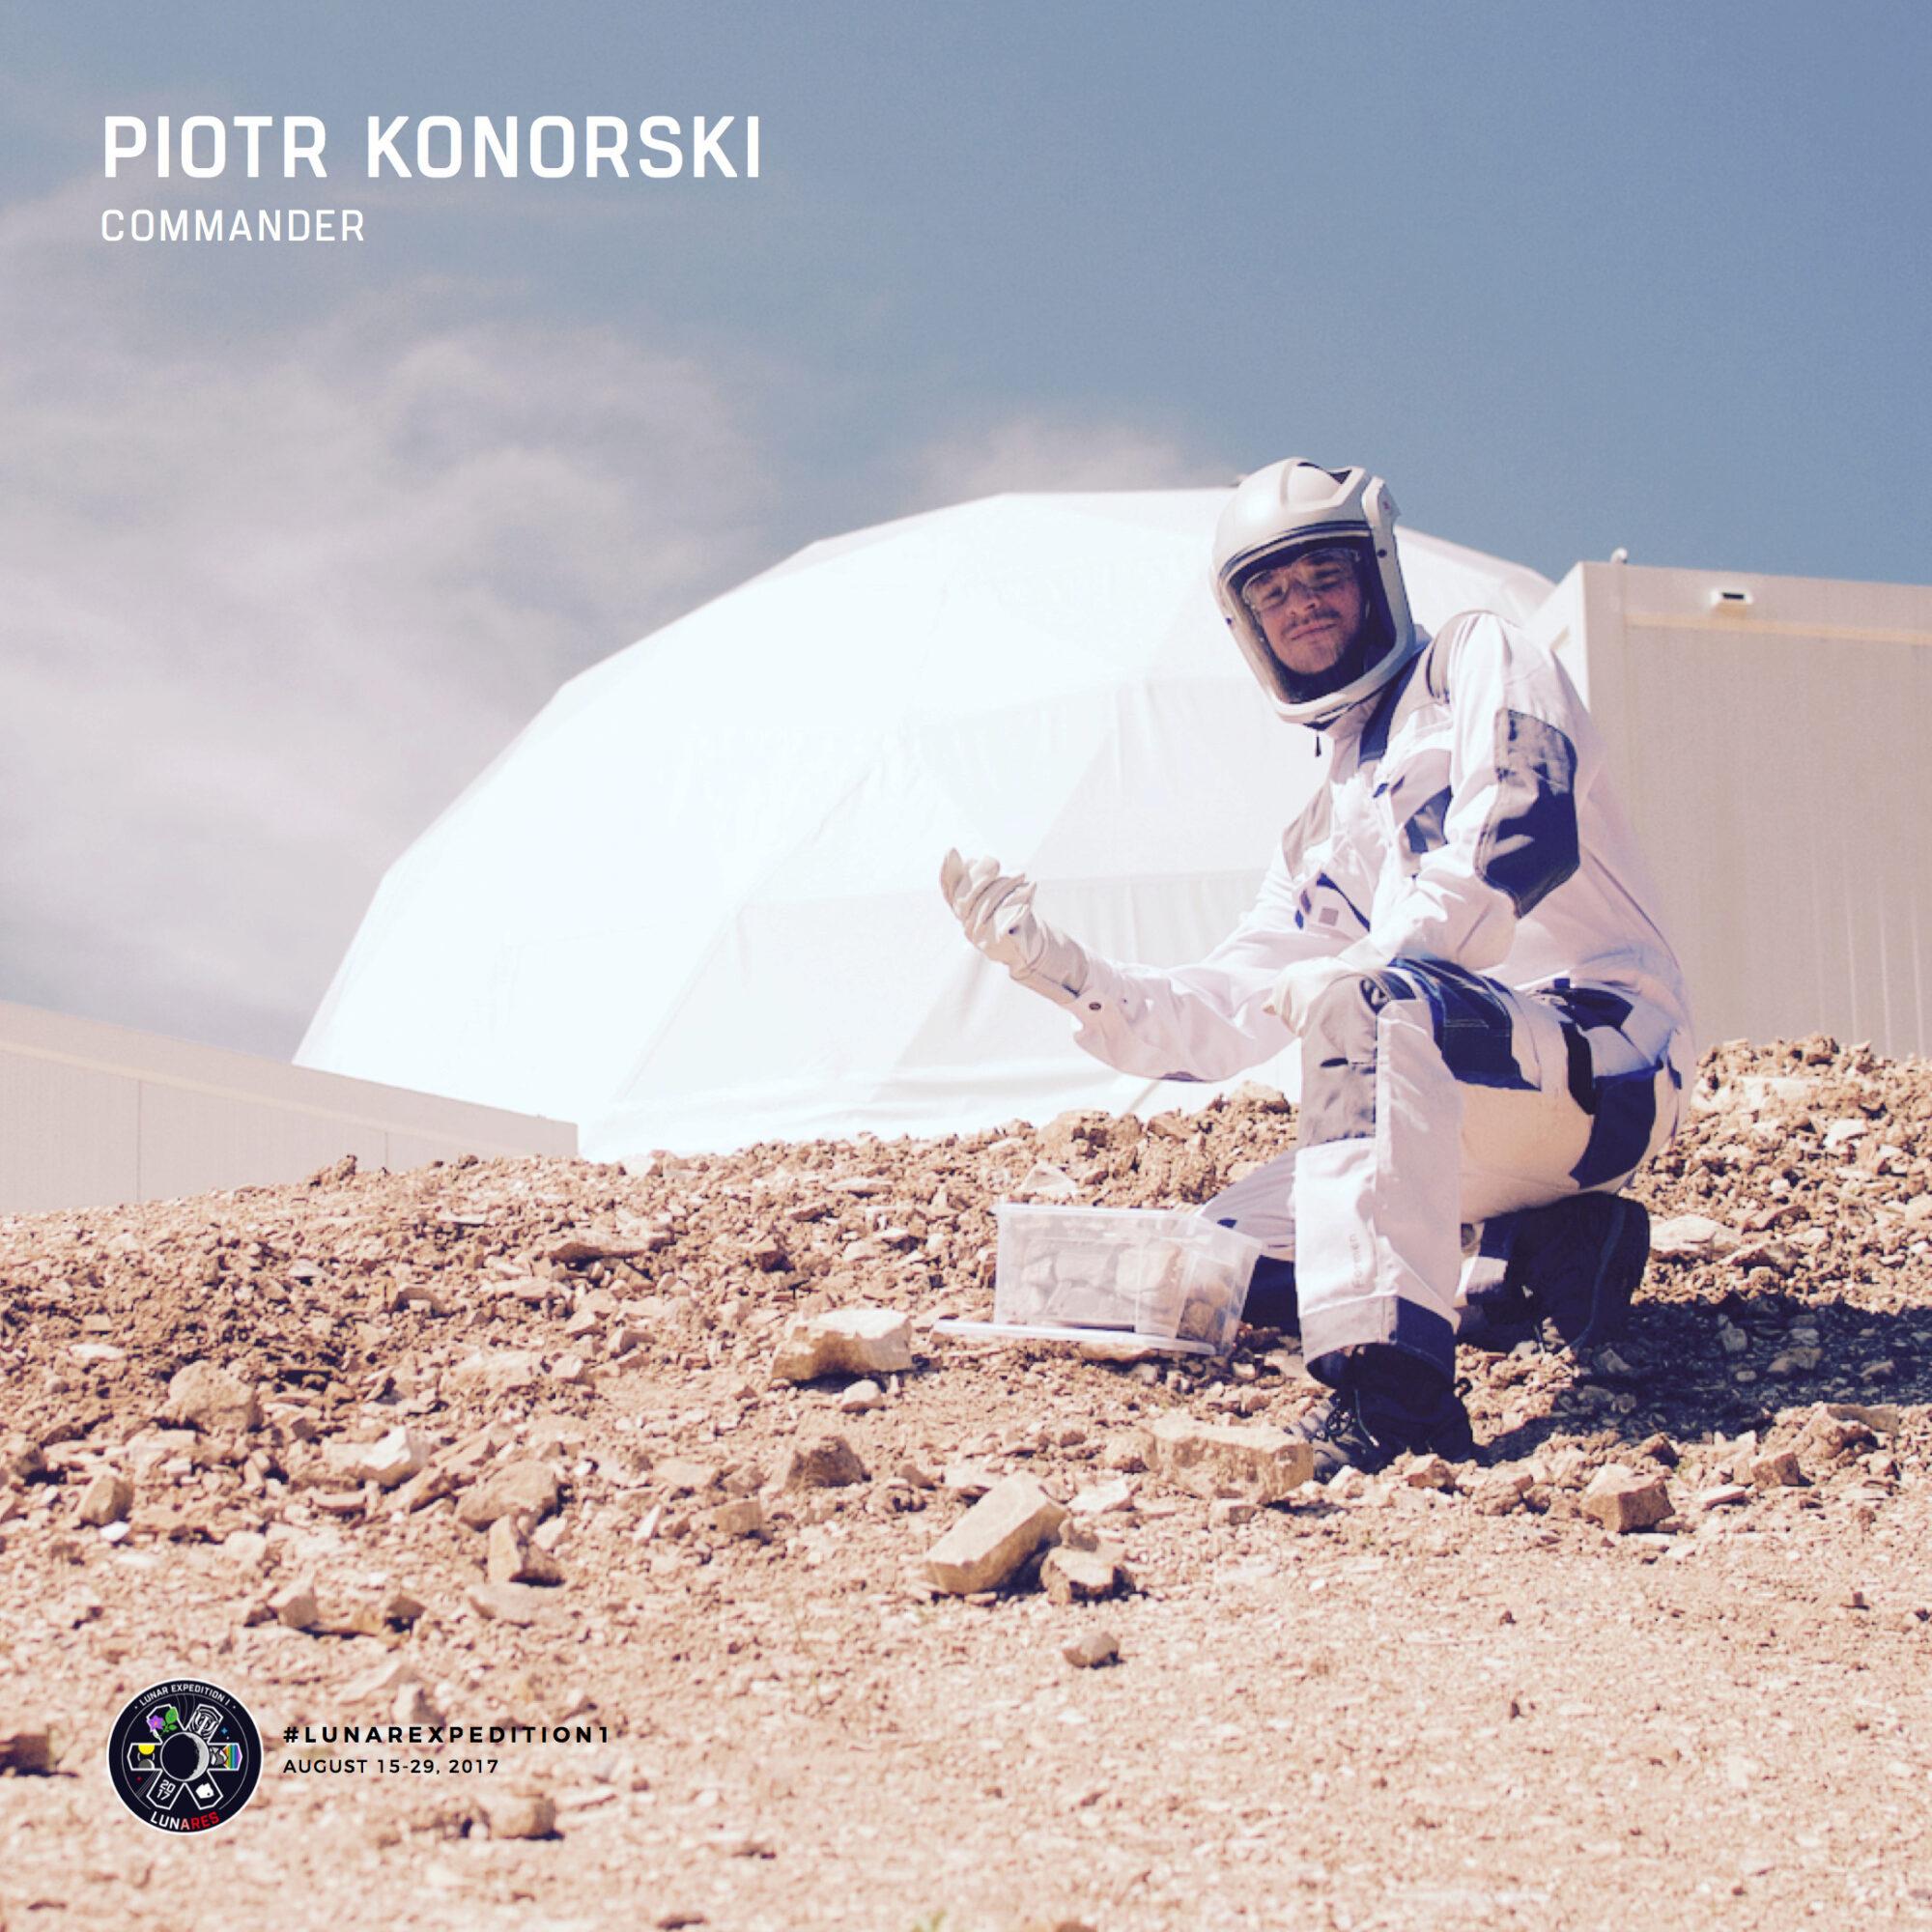 lunar-expedition-01/pkonorski-profile.jpg